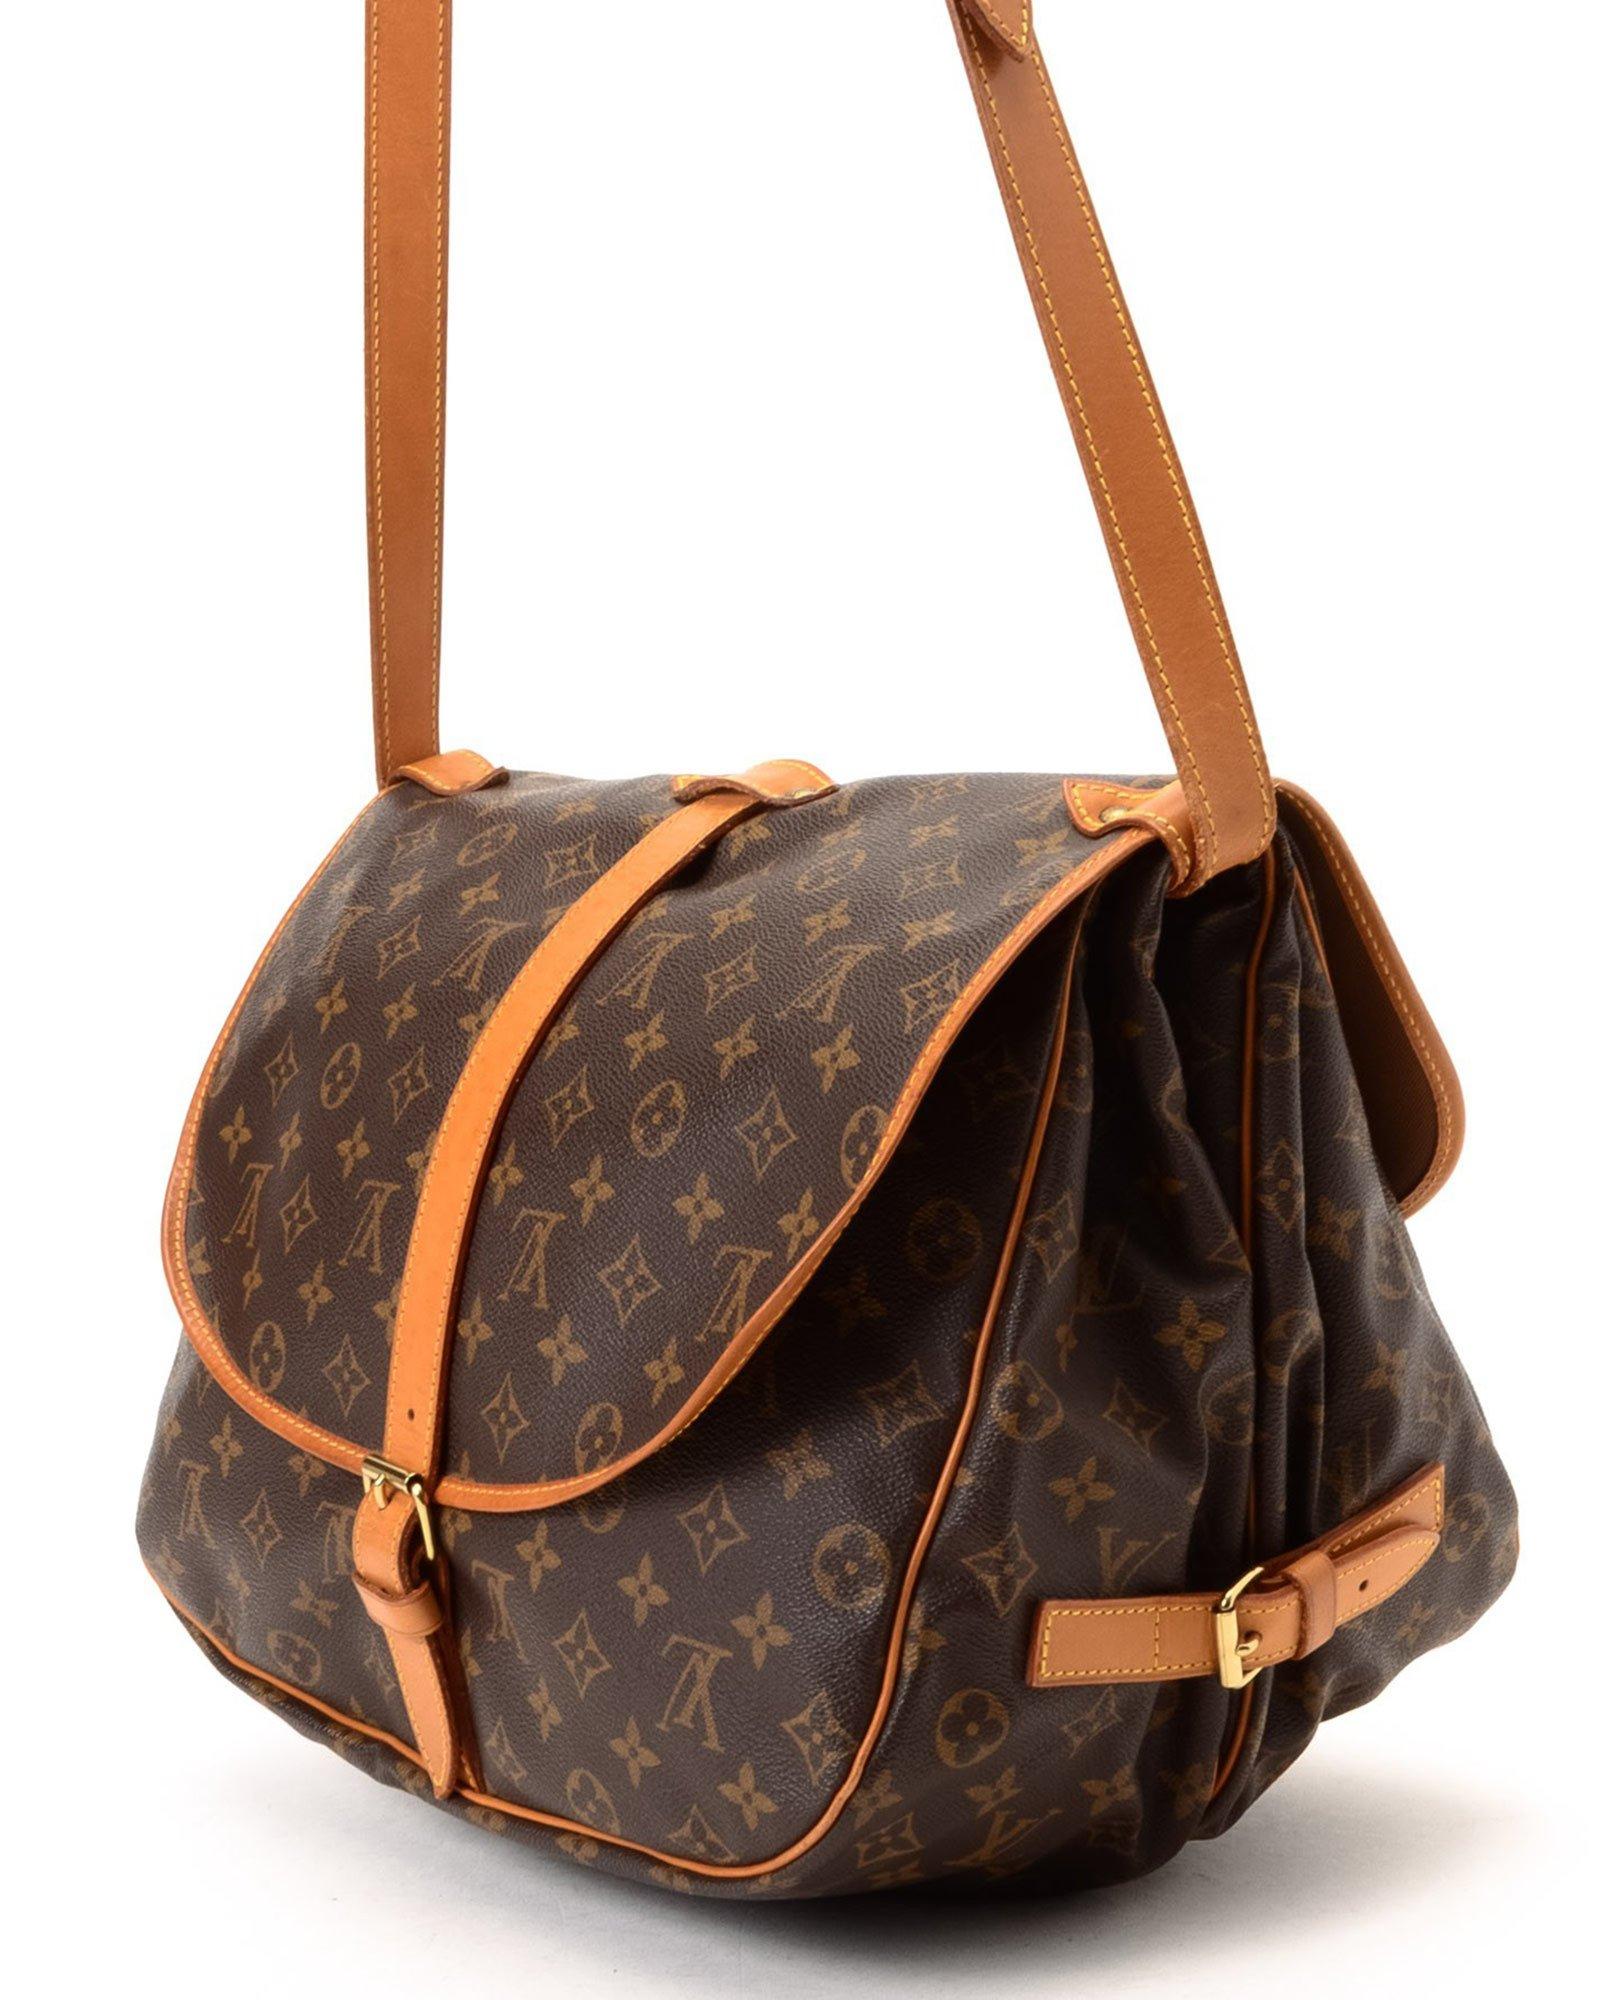 Lyst - Louis Vuitton Crossbody Bag - Vintage in Brown